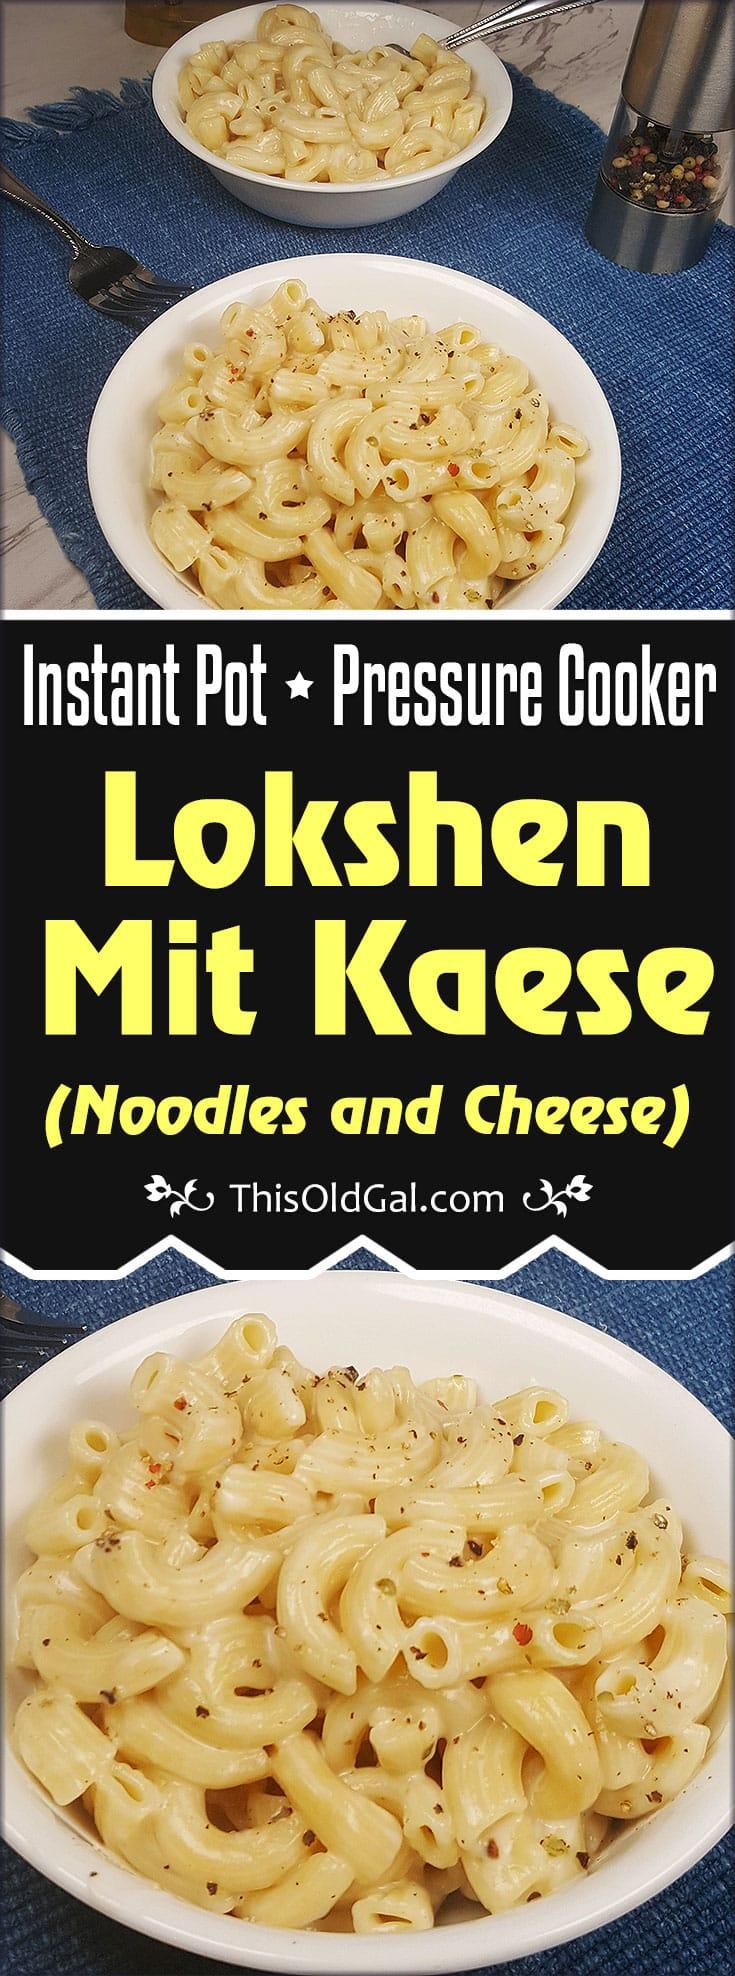 Pressure Cooker Lokshen Mit Kaese